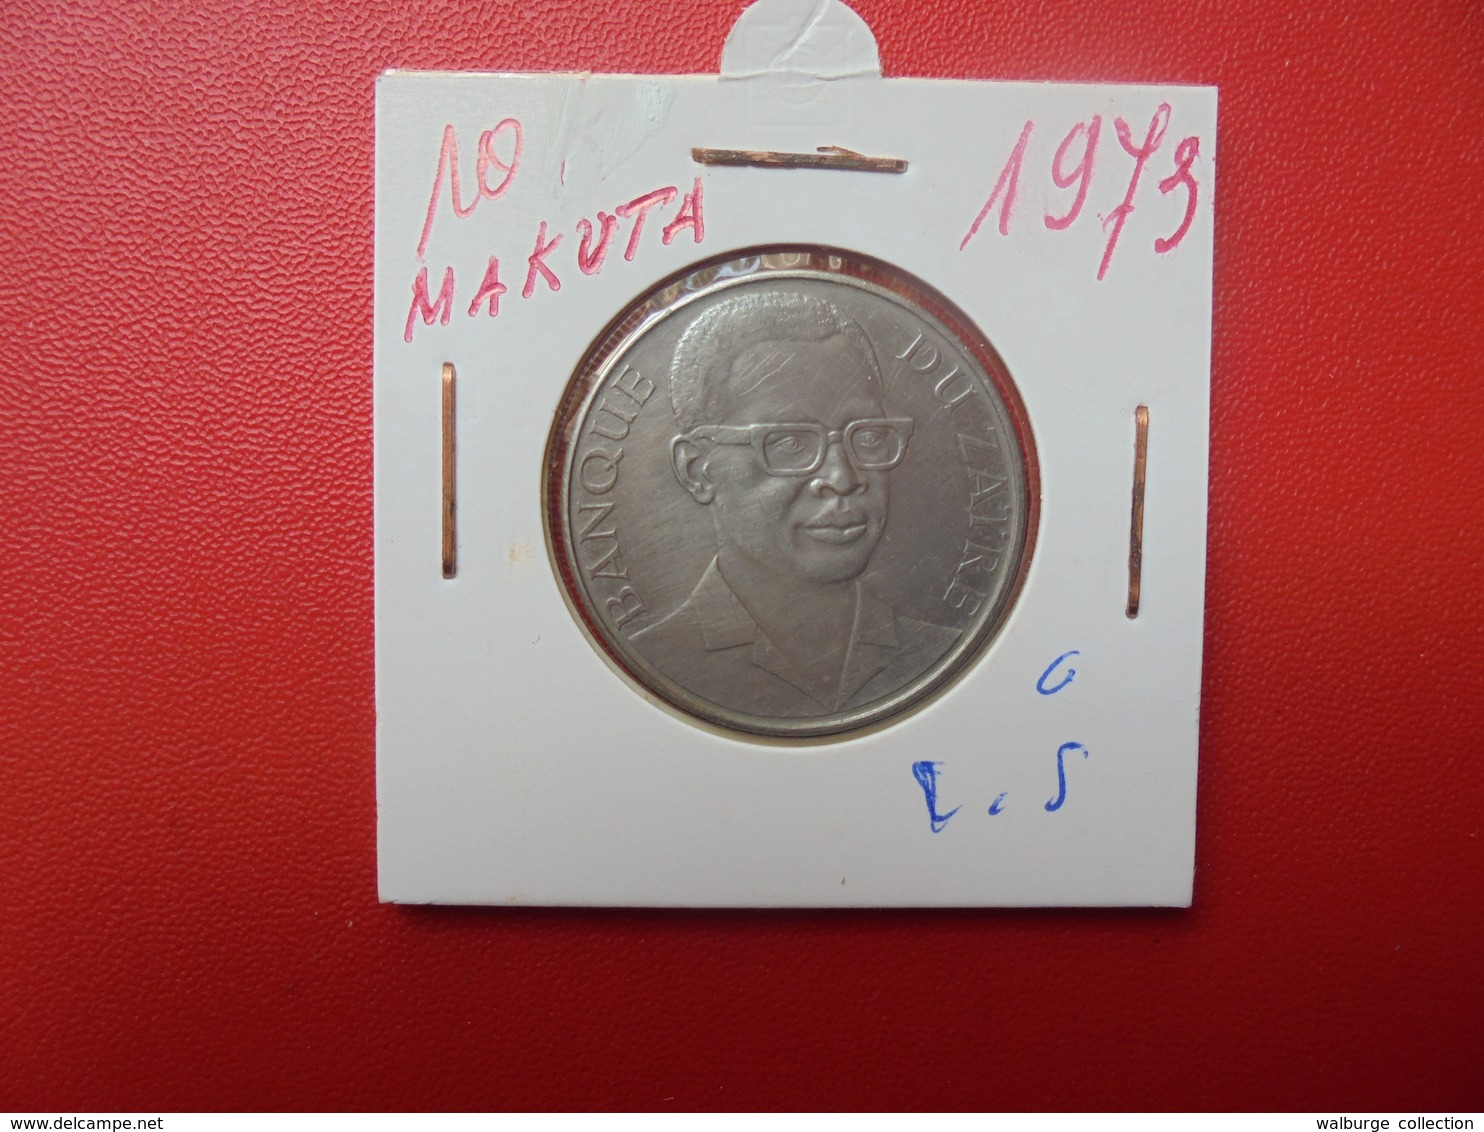 ZAIRE 10 MAKUTA 1973 - Zaire (1971-97)